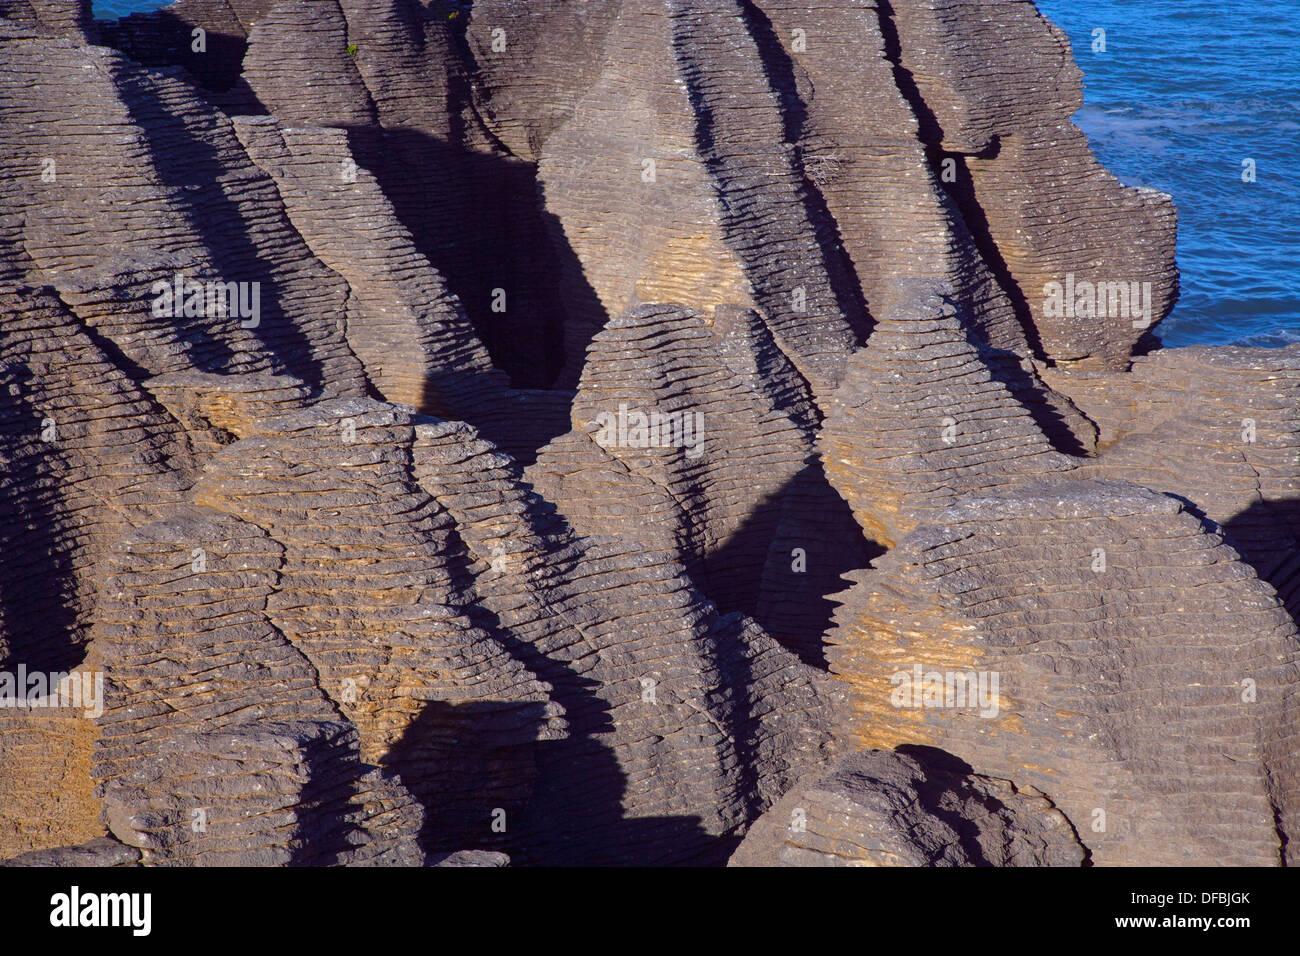 En Punakaiki Pancake Rocks en la Isla Sur de Nueva Zelanda Imagen De Stock